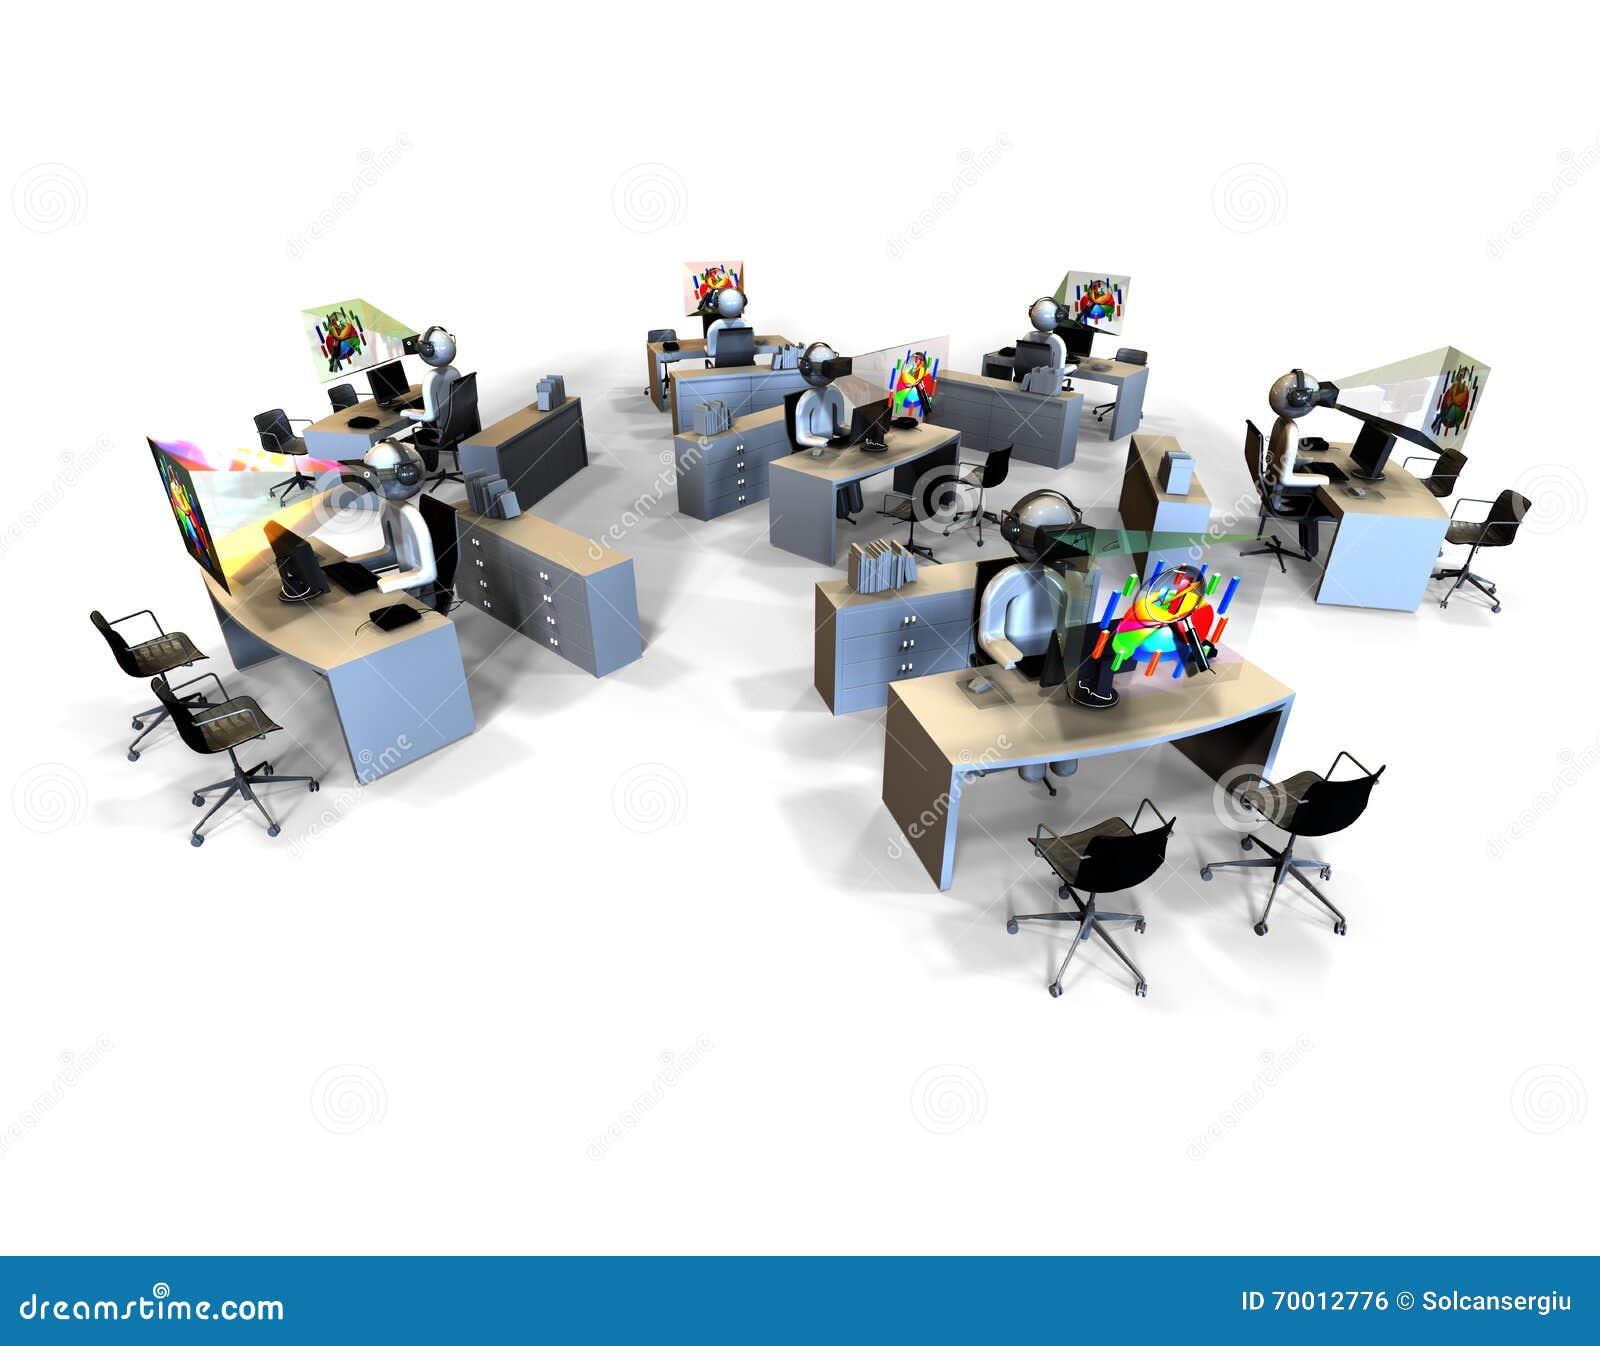 concept de bureau de r alit virtuelle illustration stock image 70012776. Black Bedroom Furniture Sets. Home Design Ideas